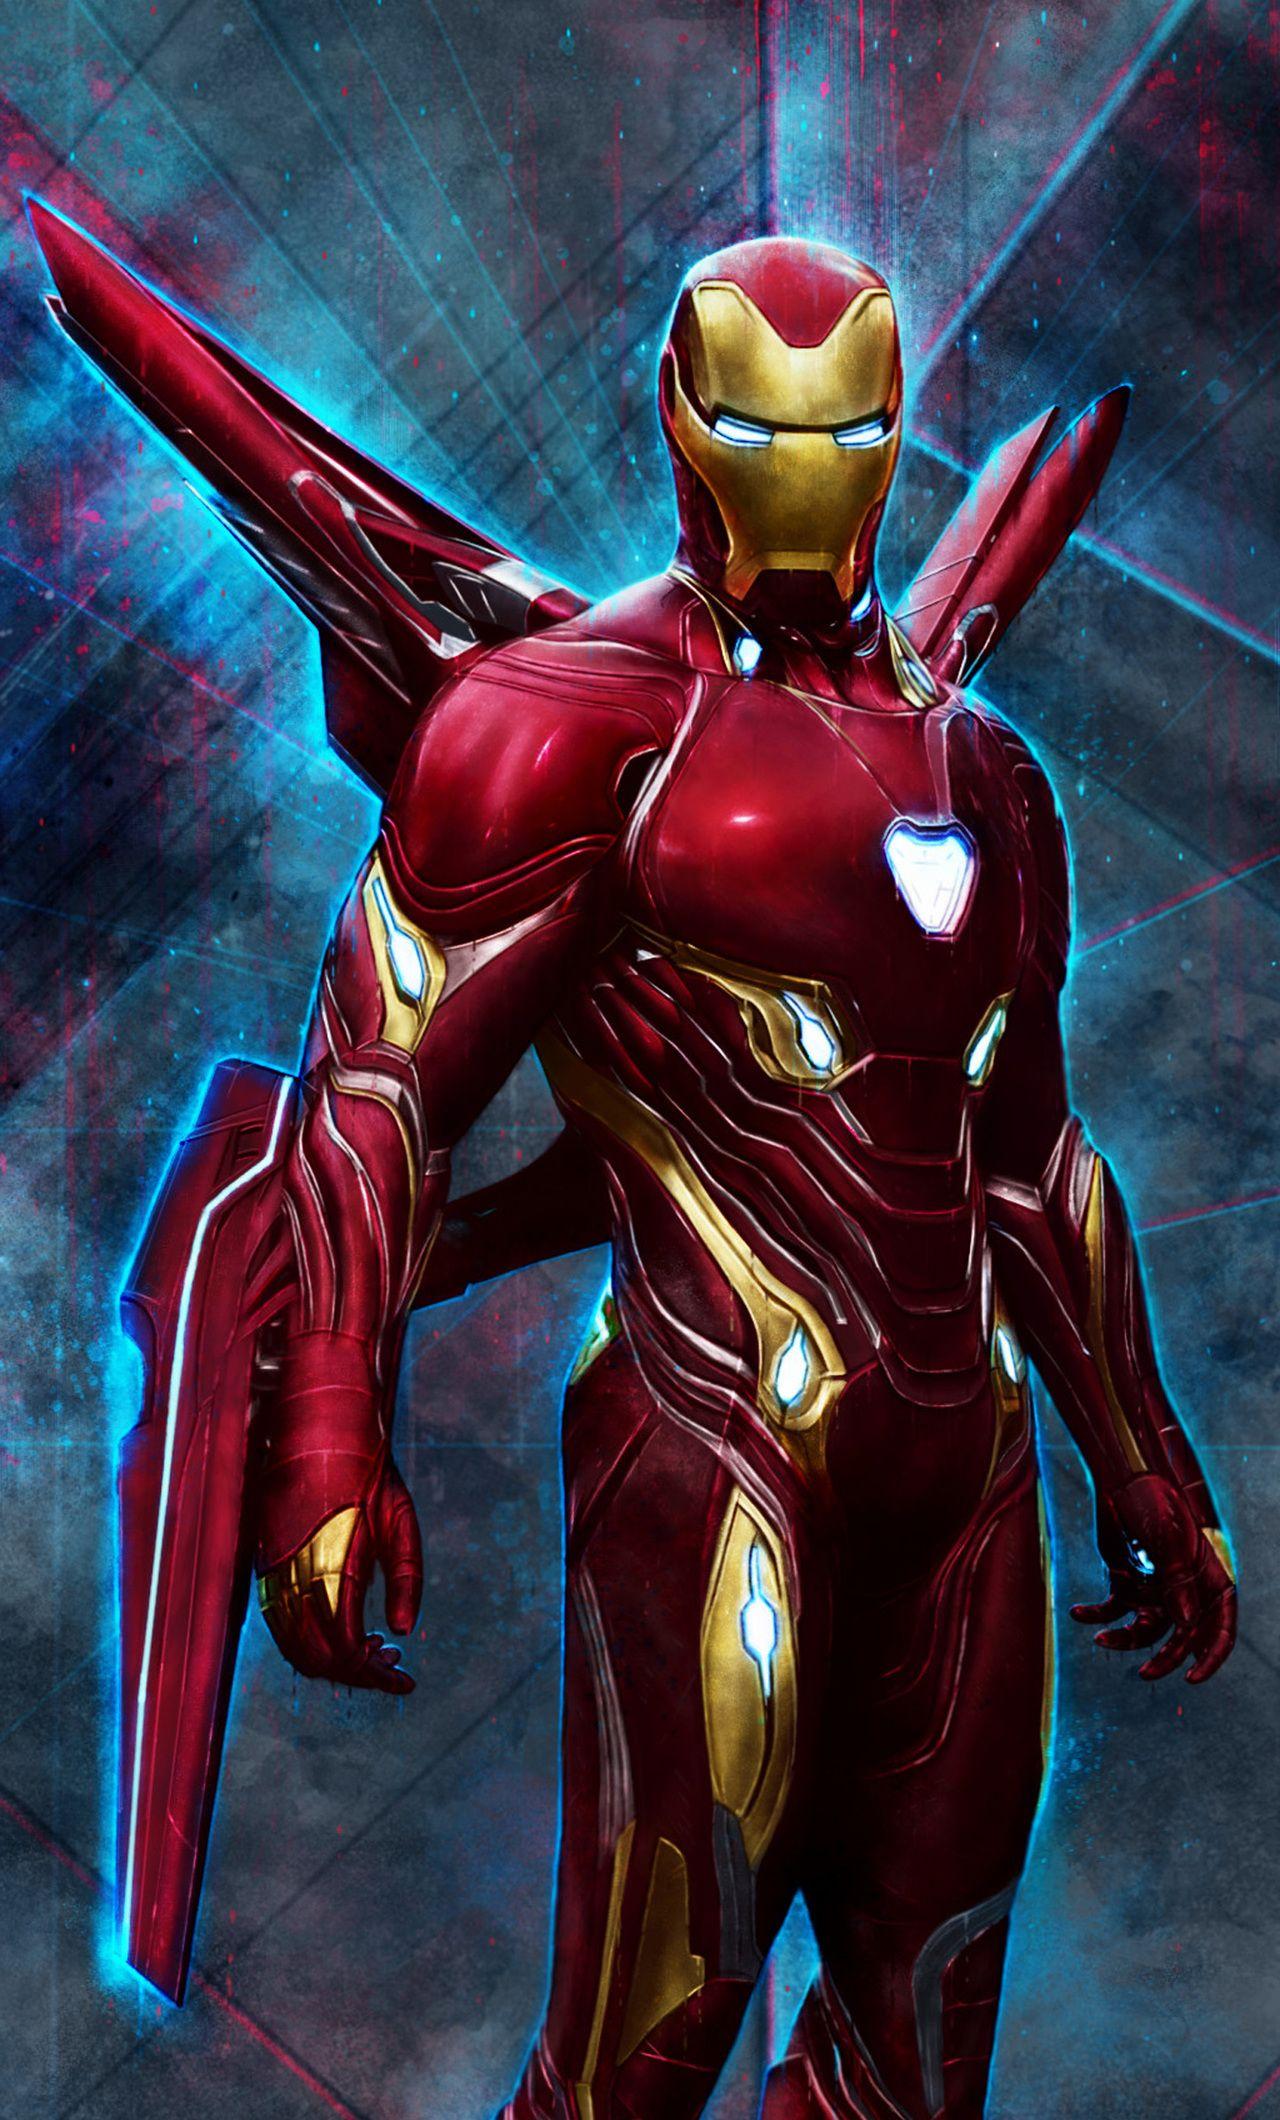 Wallpaper Iron Man Images